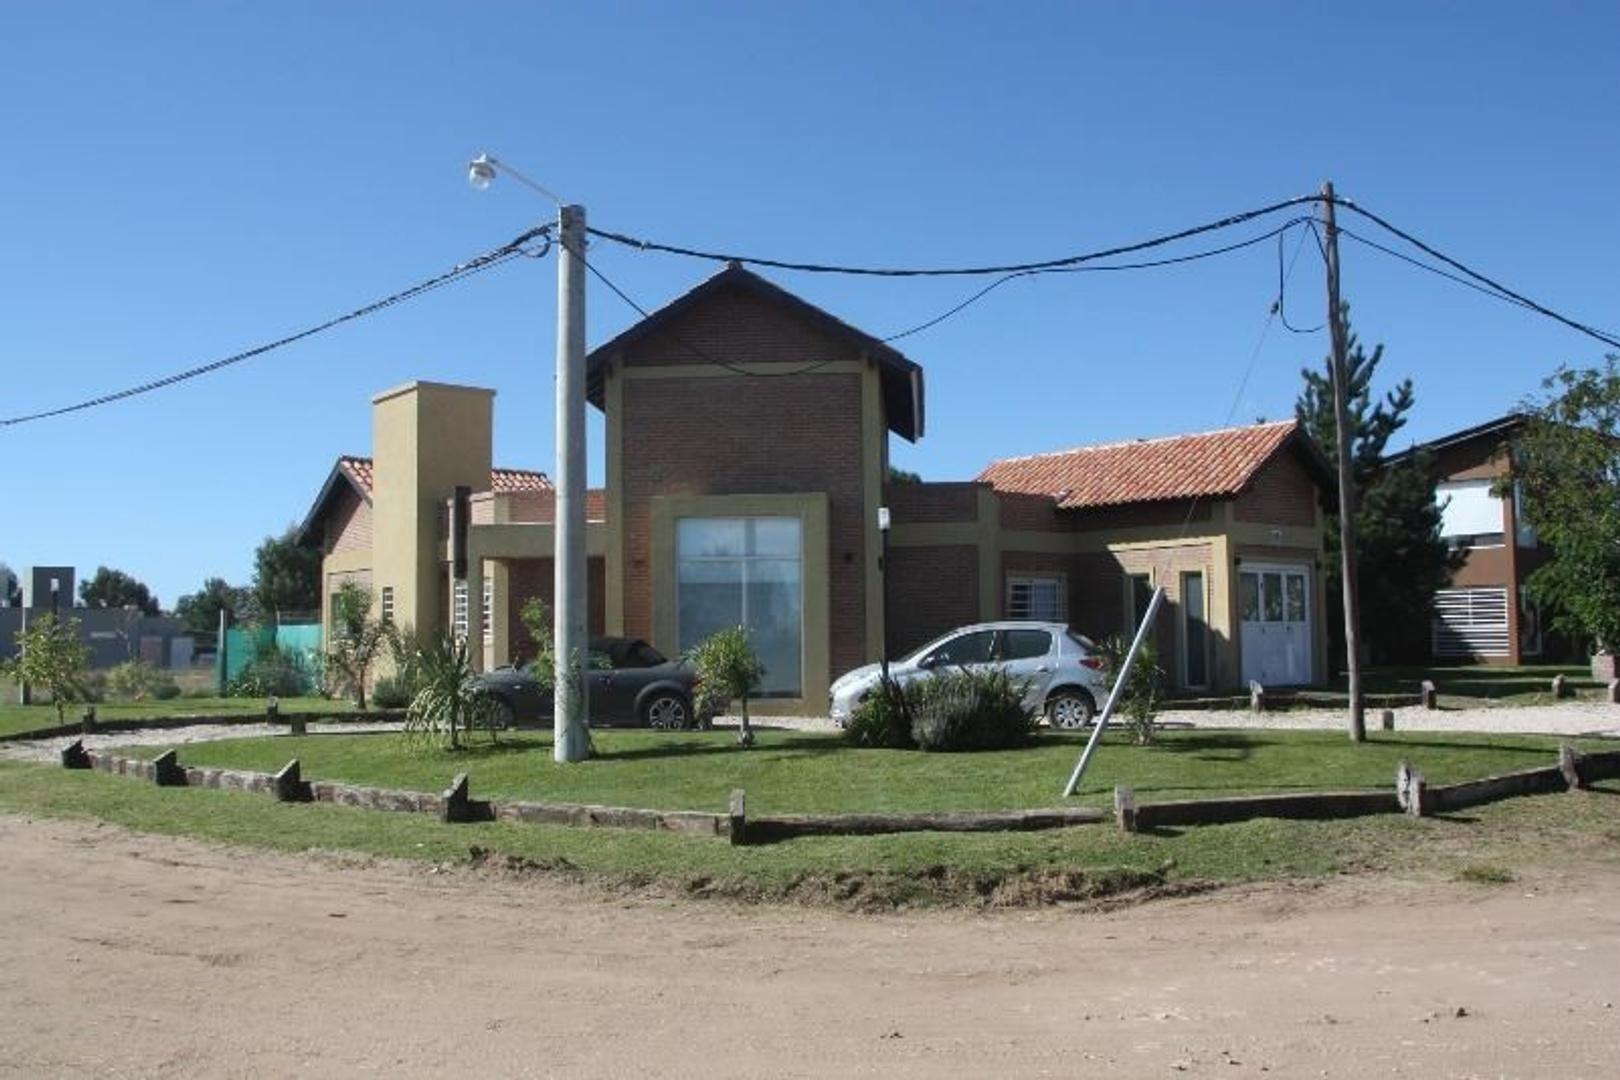 EXCELENTE CASA EN BARRIO SAN RAFAEL (MAR DE AJO)